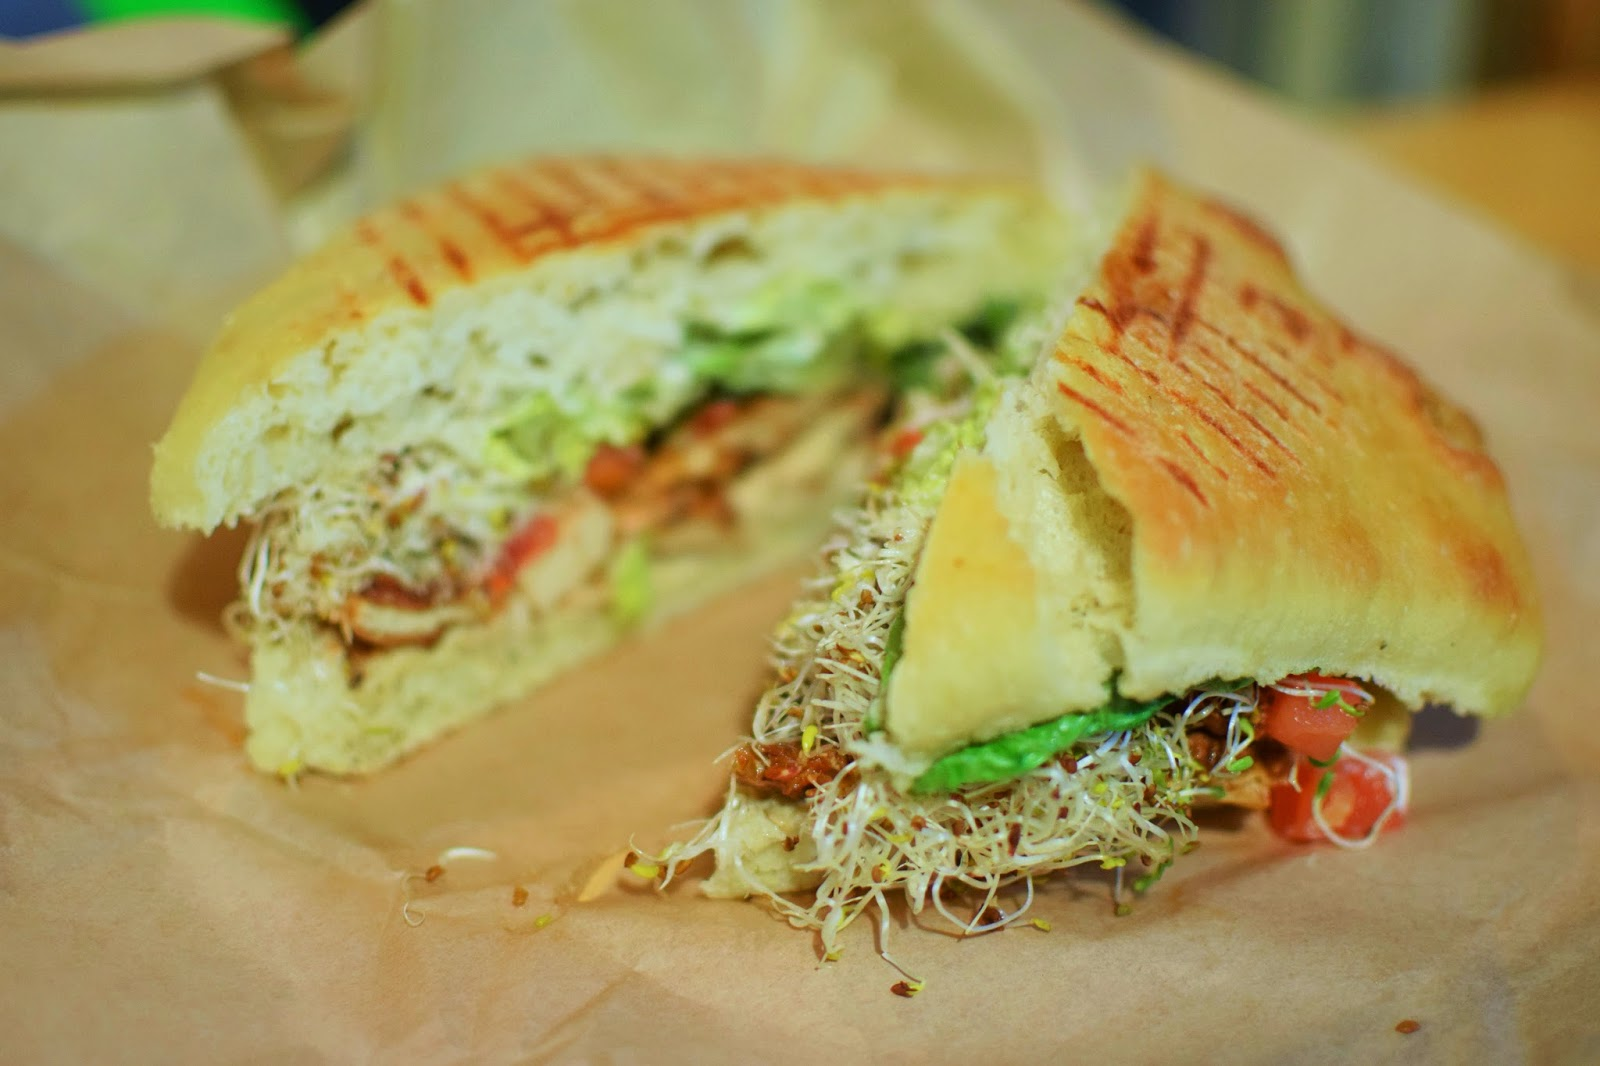 BBQ tofu sandwich from Urban Herbivore Toronto